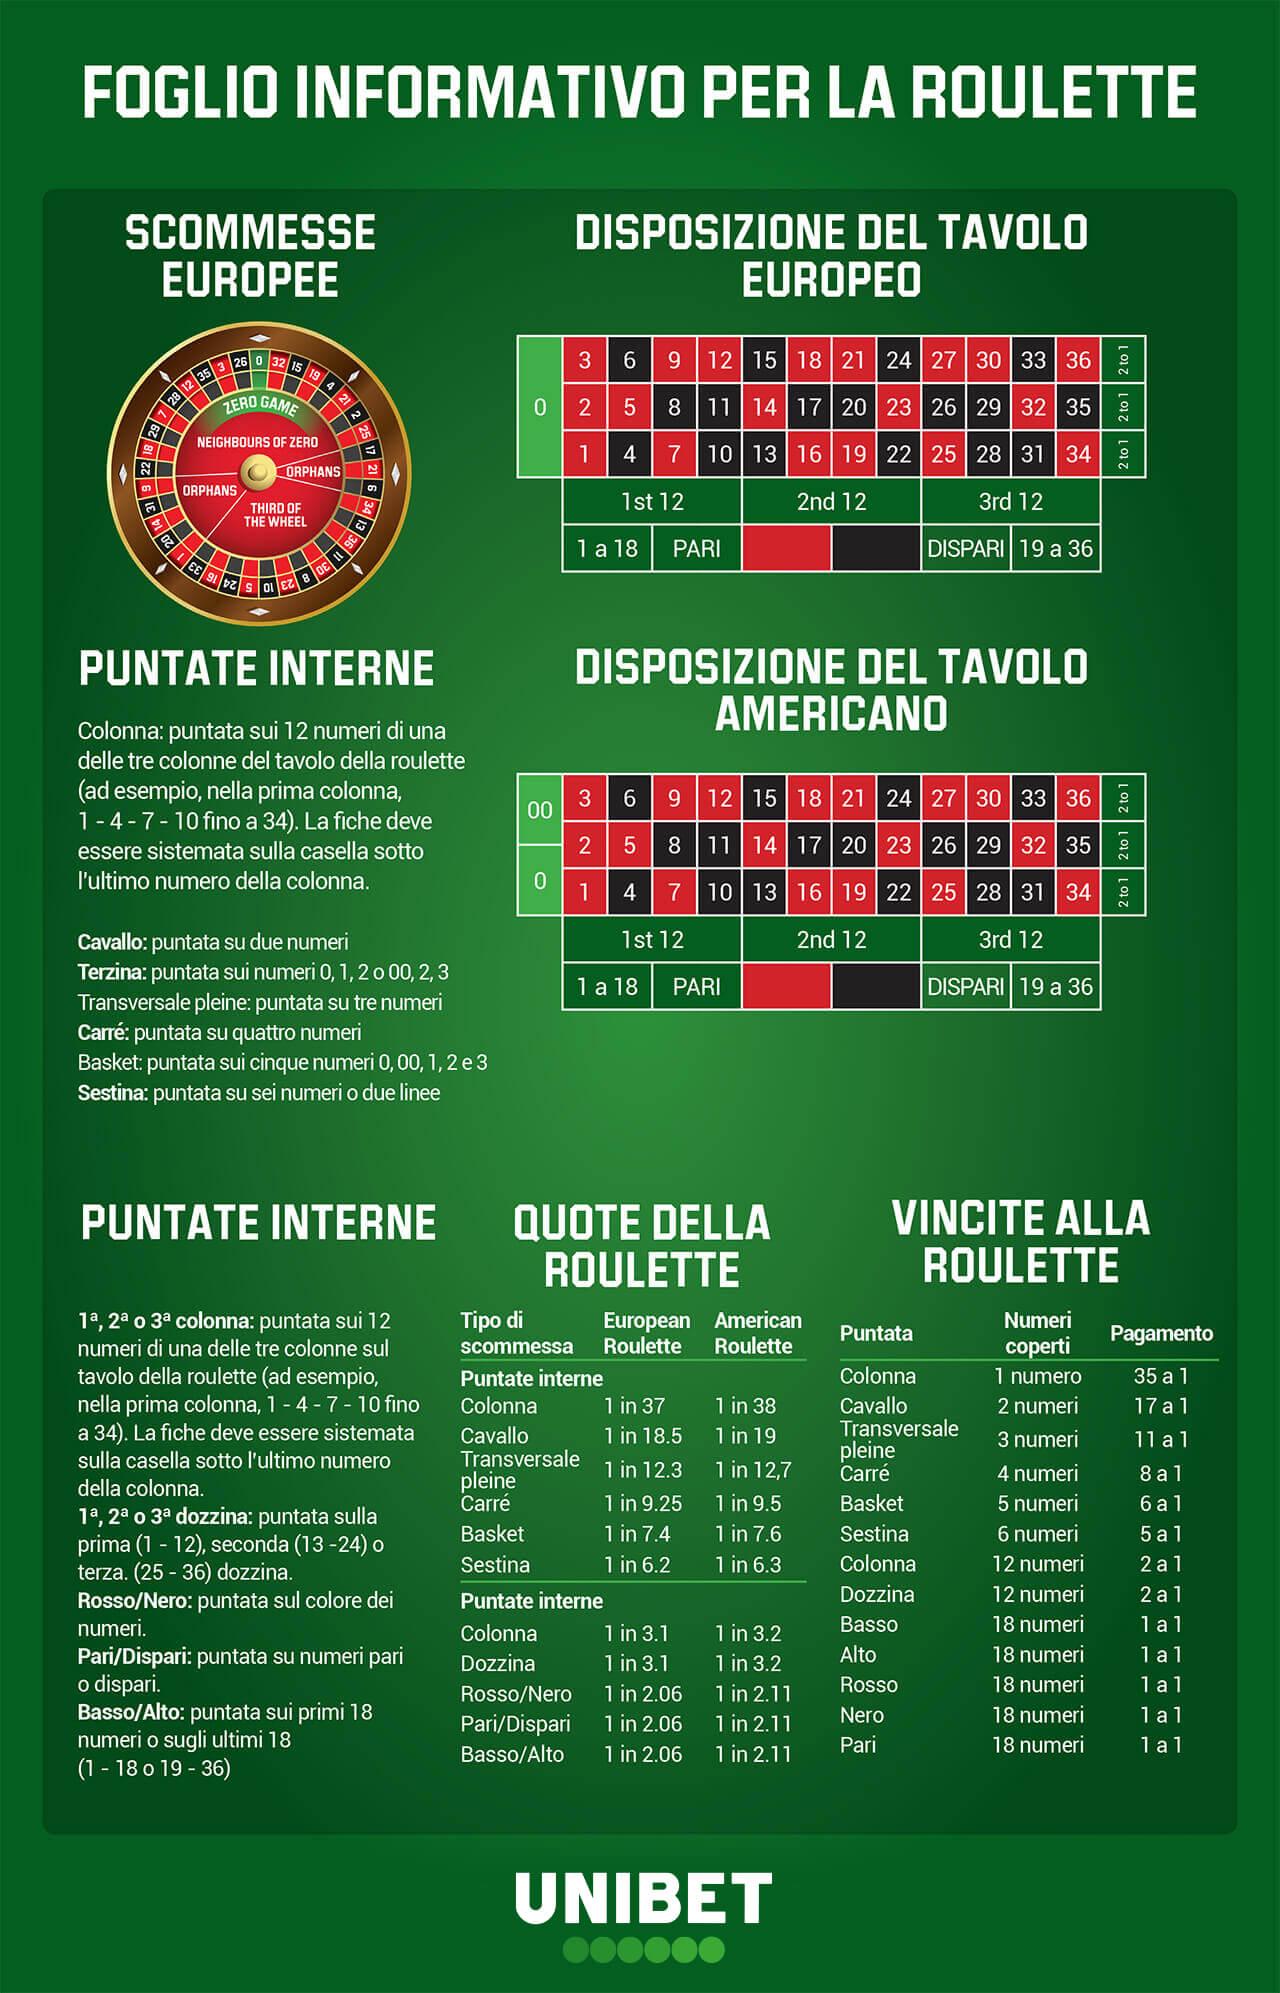 roulette-cheat-sheet-it